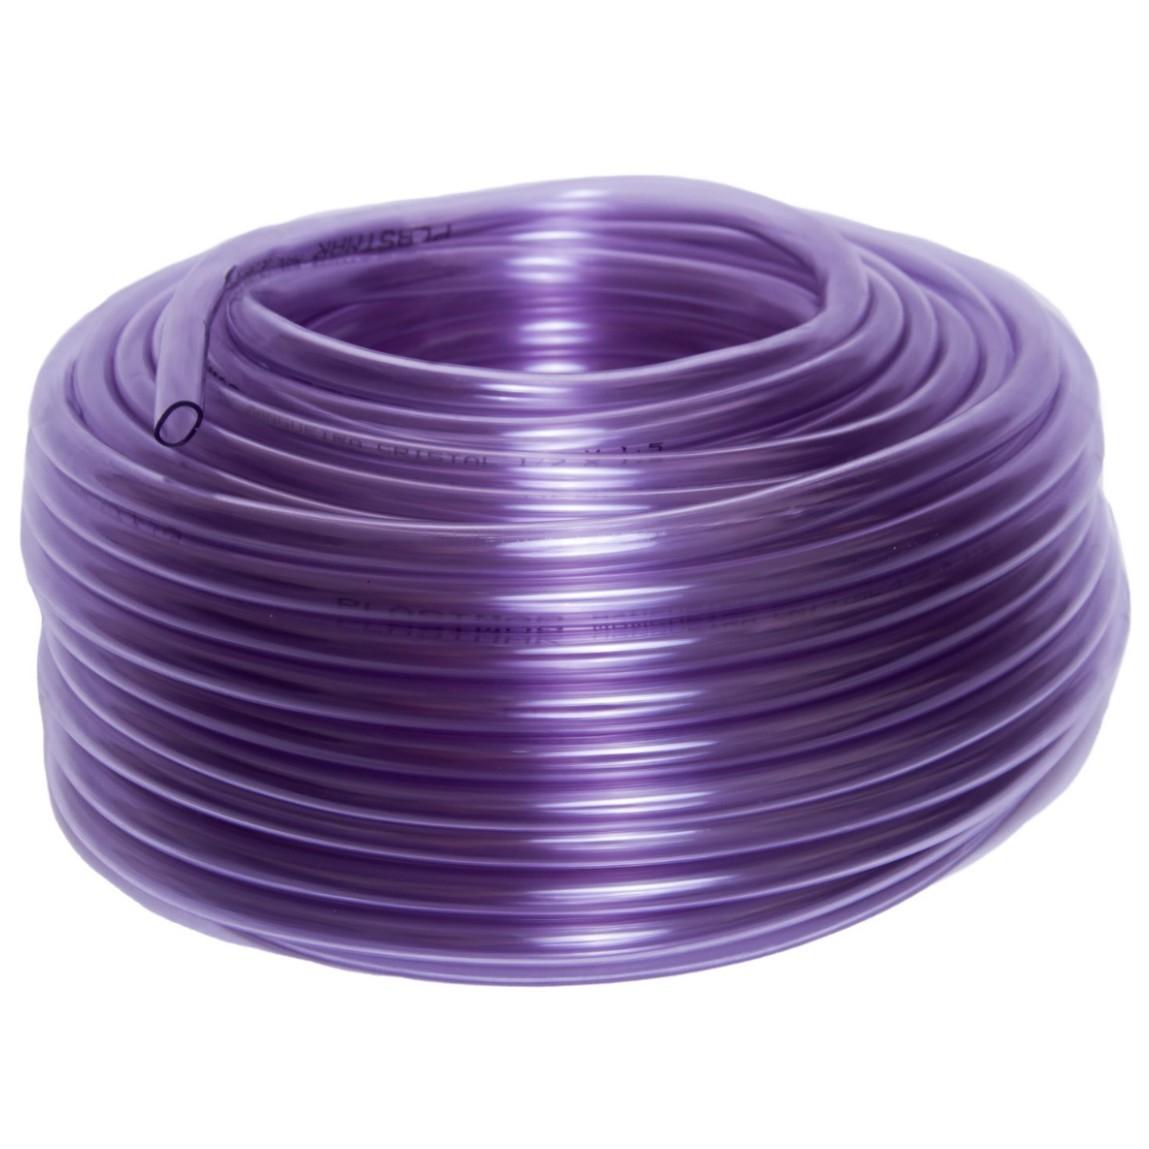 Mangueira de PVC 20m 1 Roxa 1823 - Plastmar